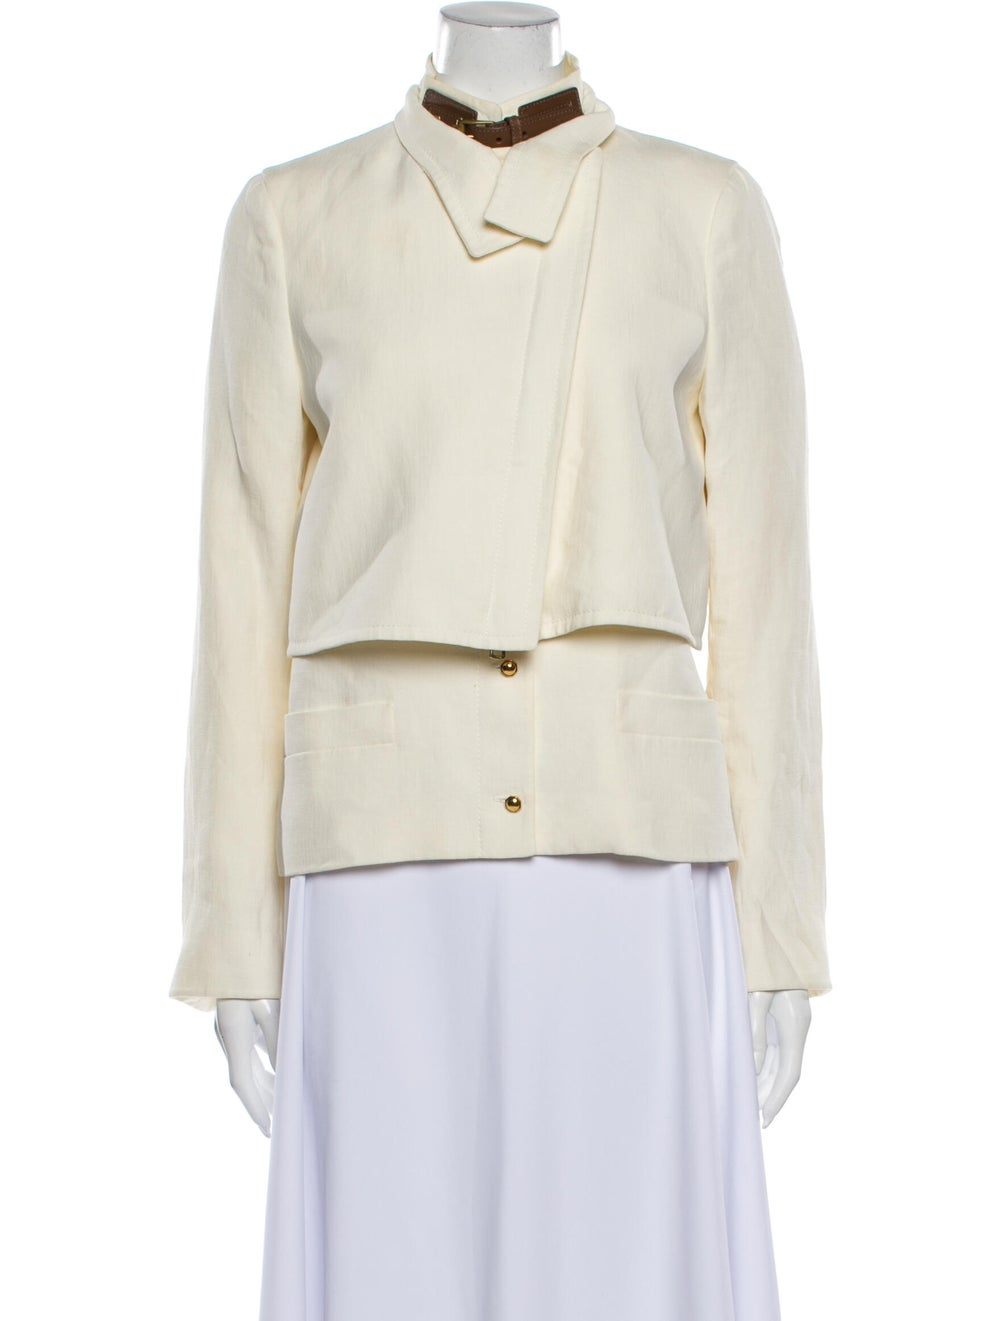 Gucci Linen Jacket - image 4